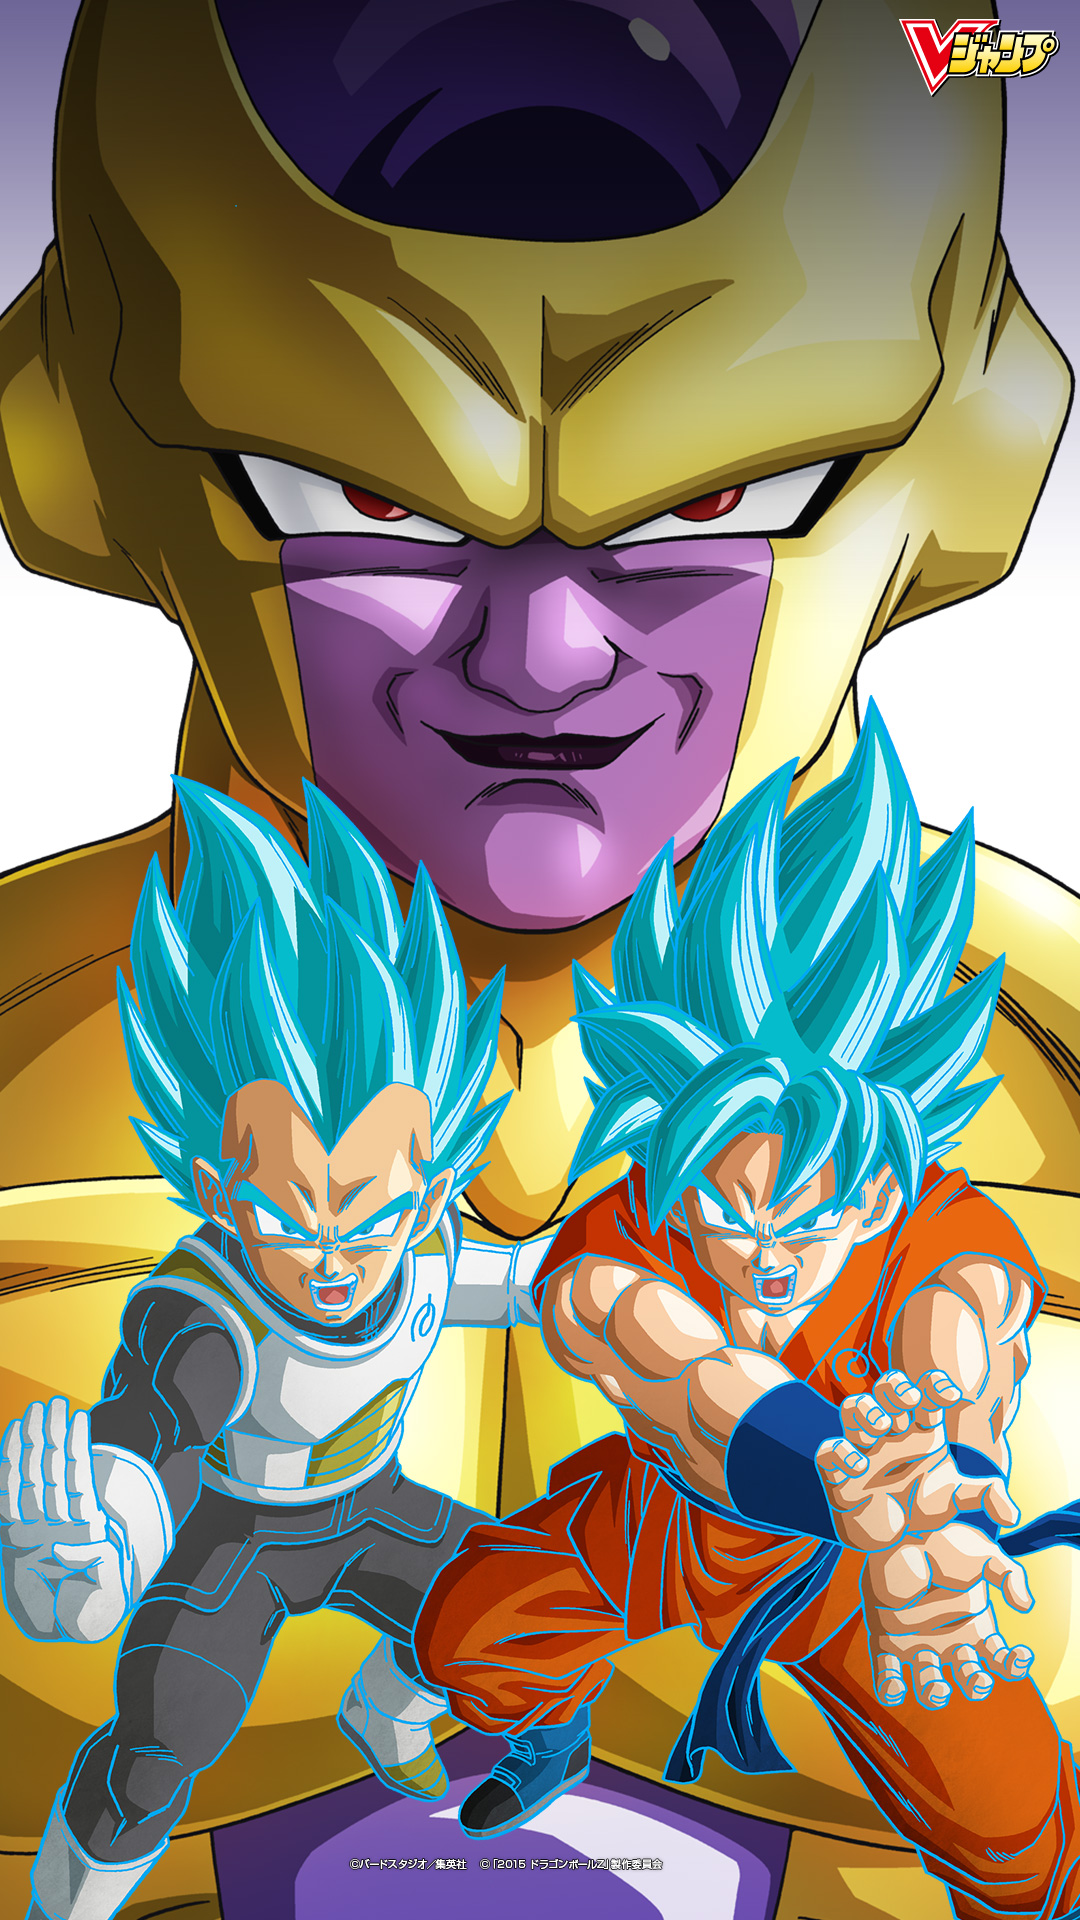 Dragon Ball Z Resurrection F By Dragonballzcz On Deviantart